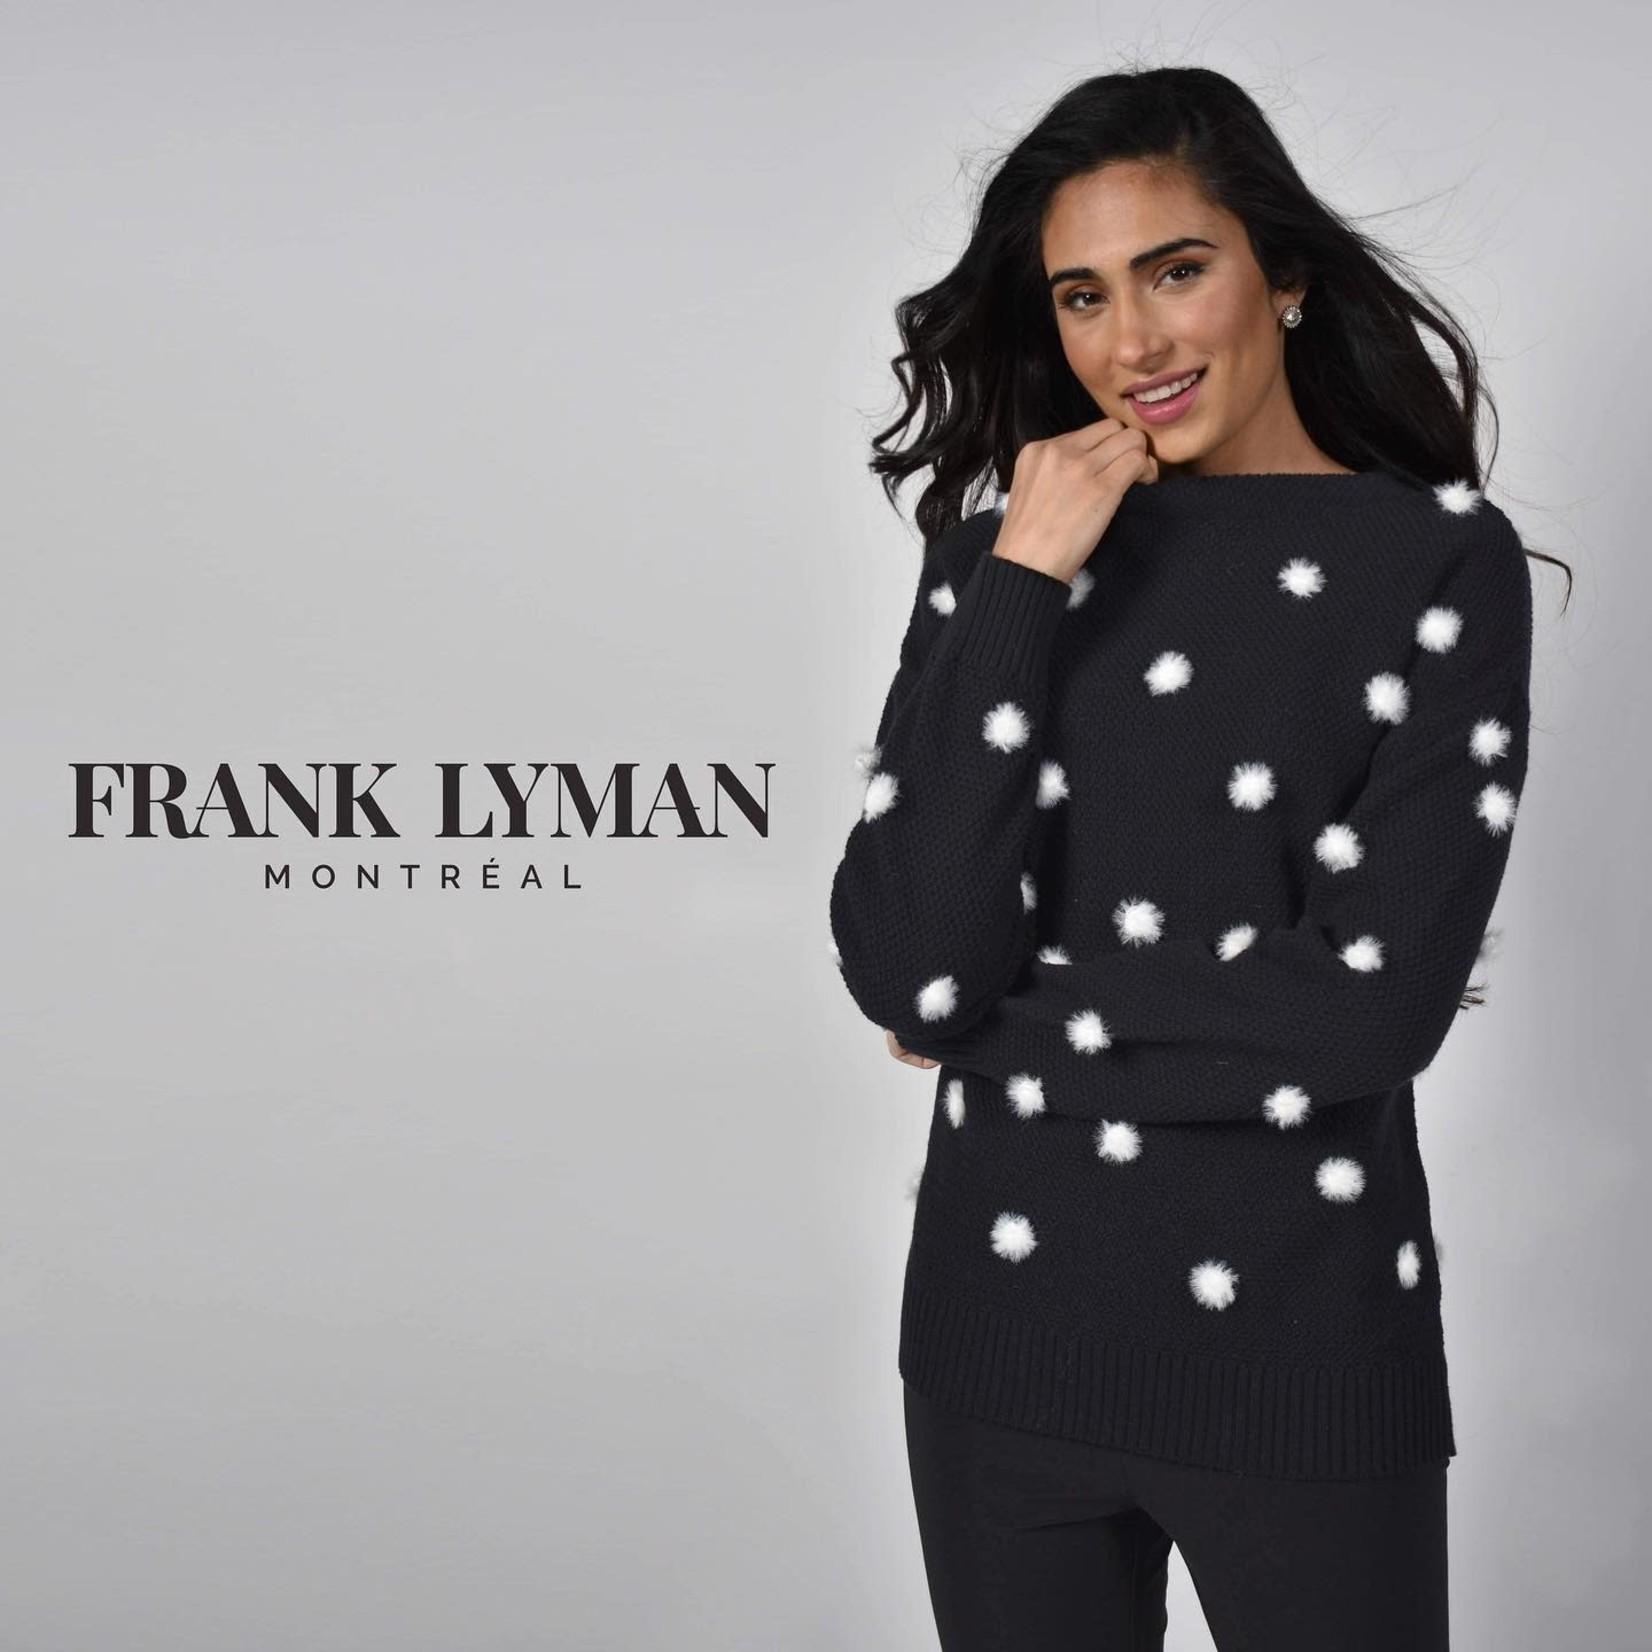 Frank Lyman Black/White Sweater Knit Top